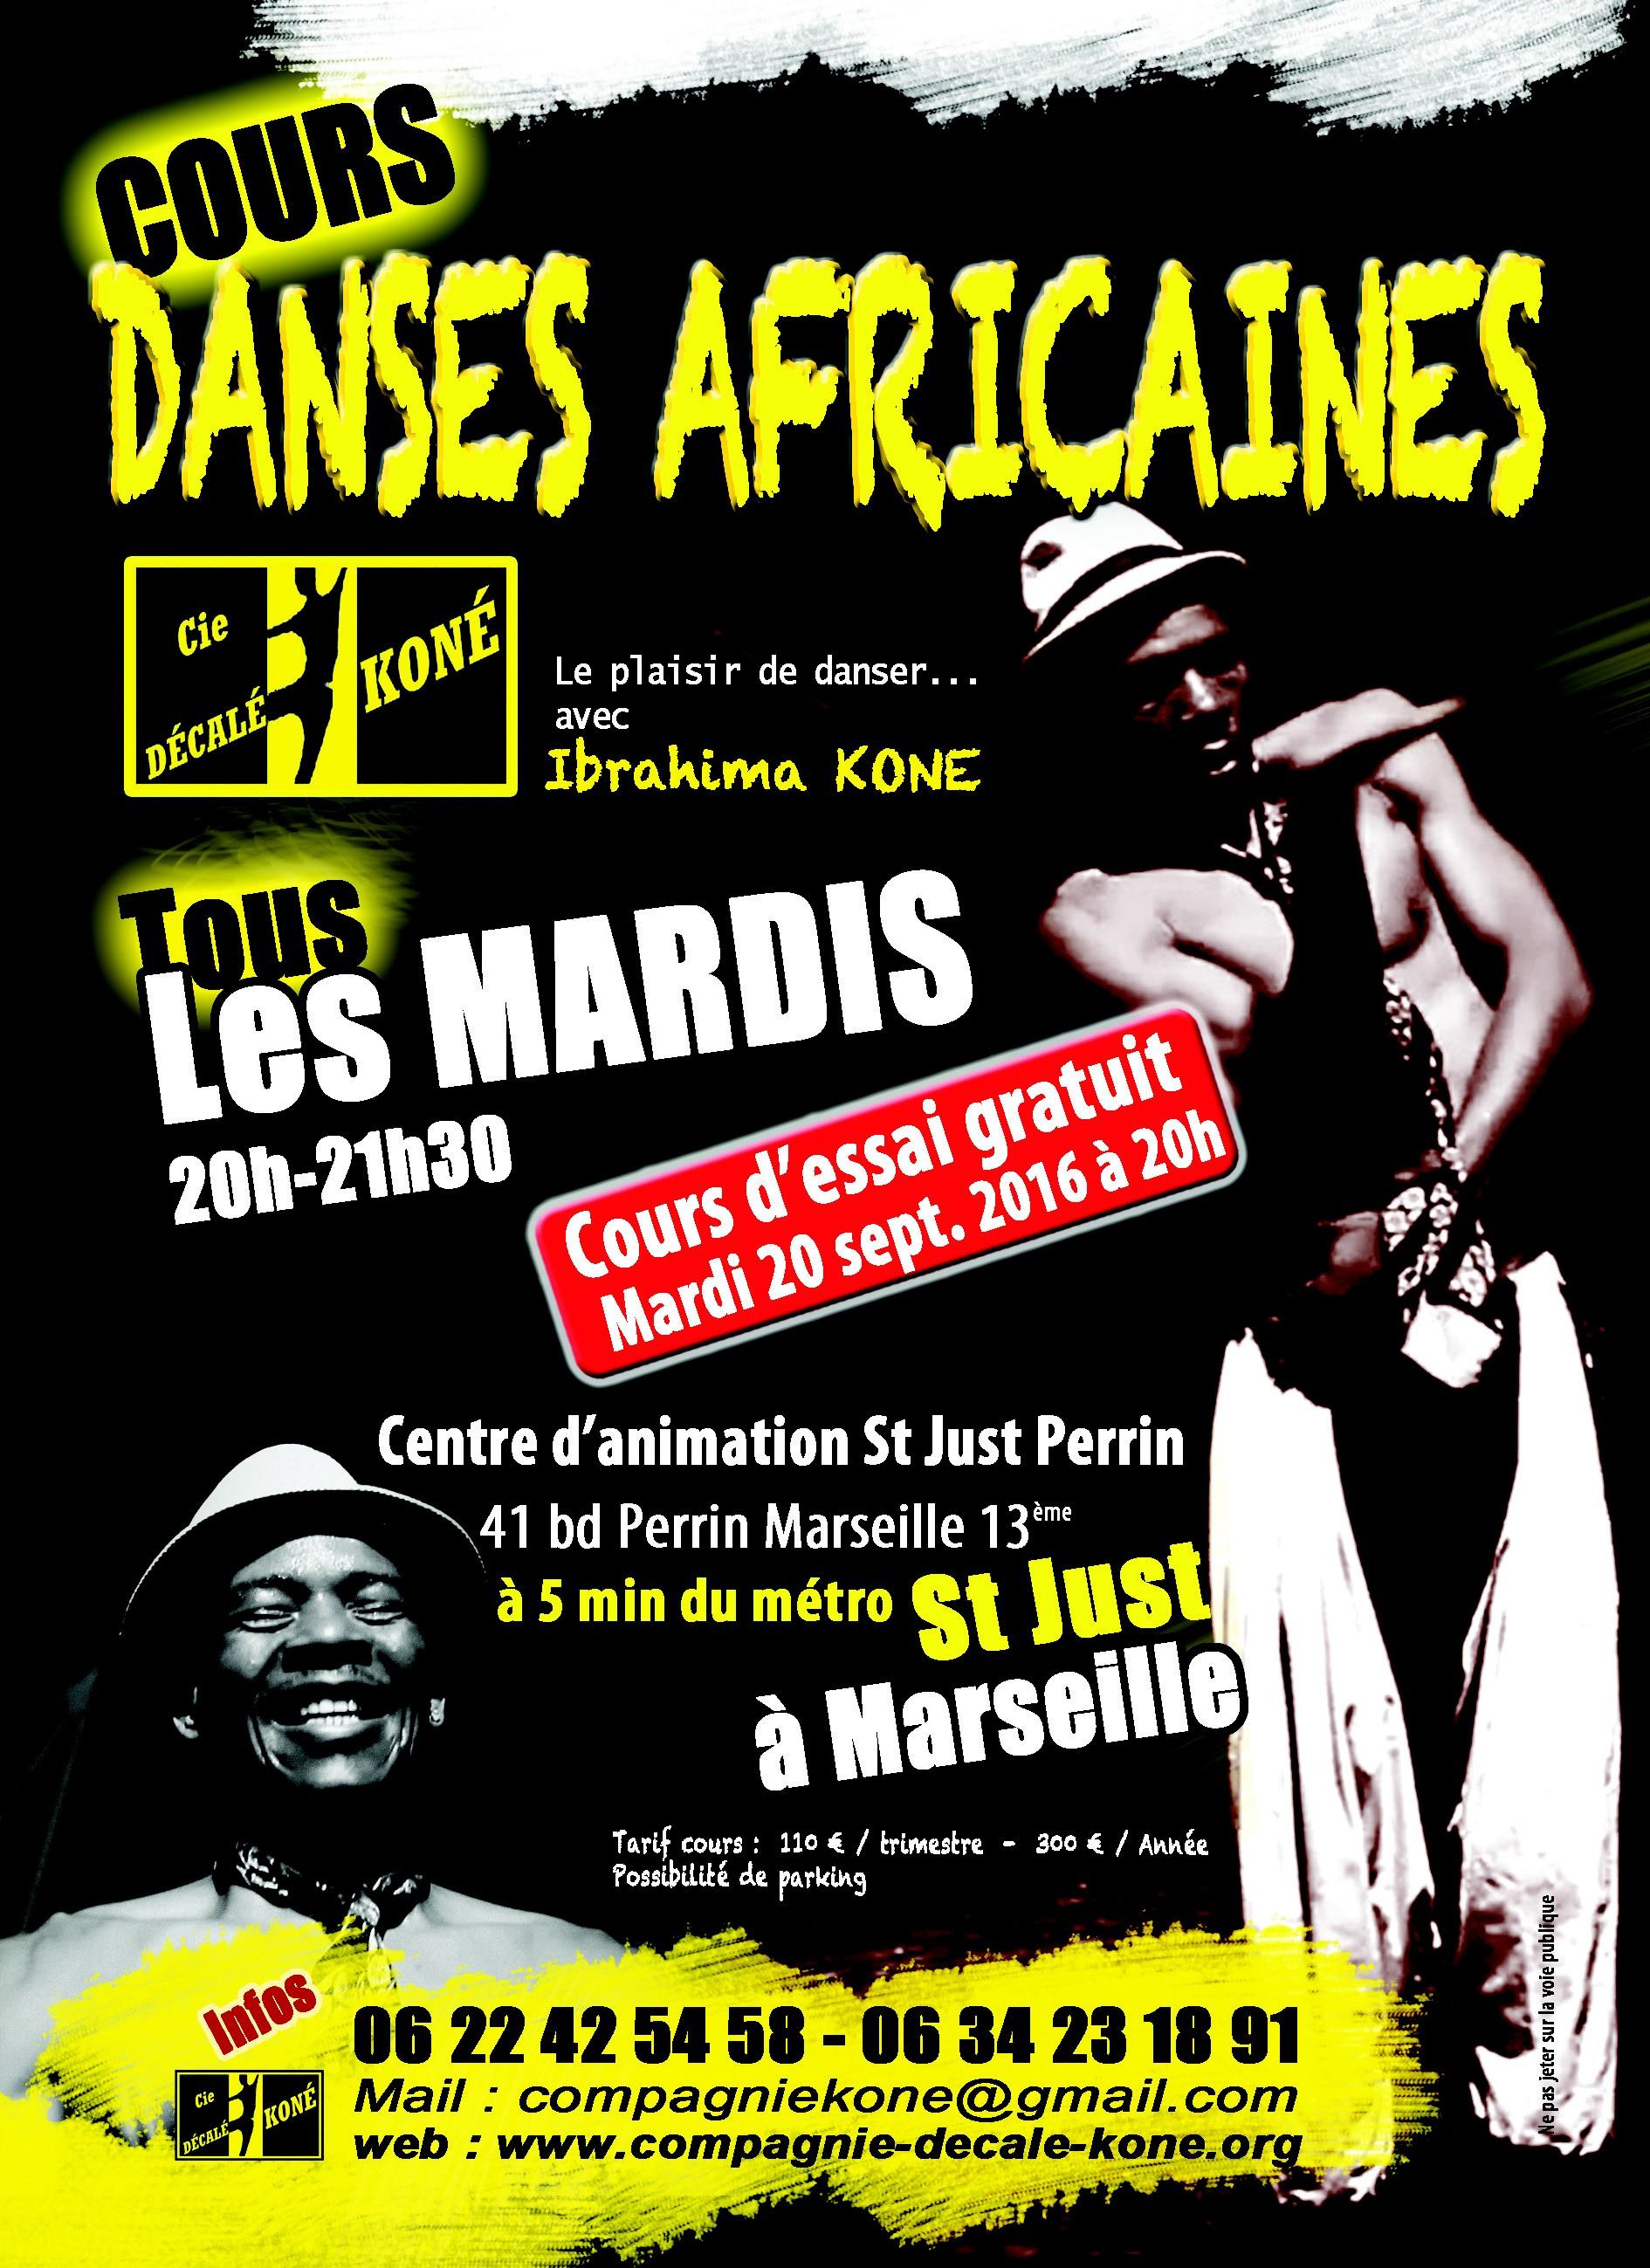 Cours danses africaines avec Ibrahima KONE..